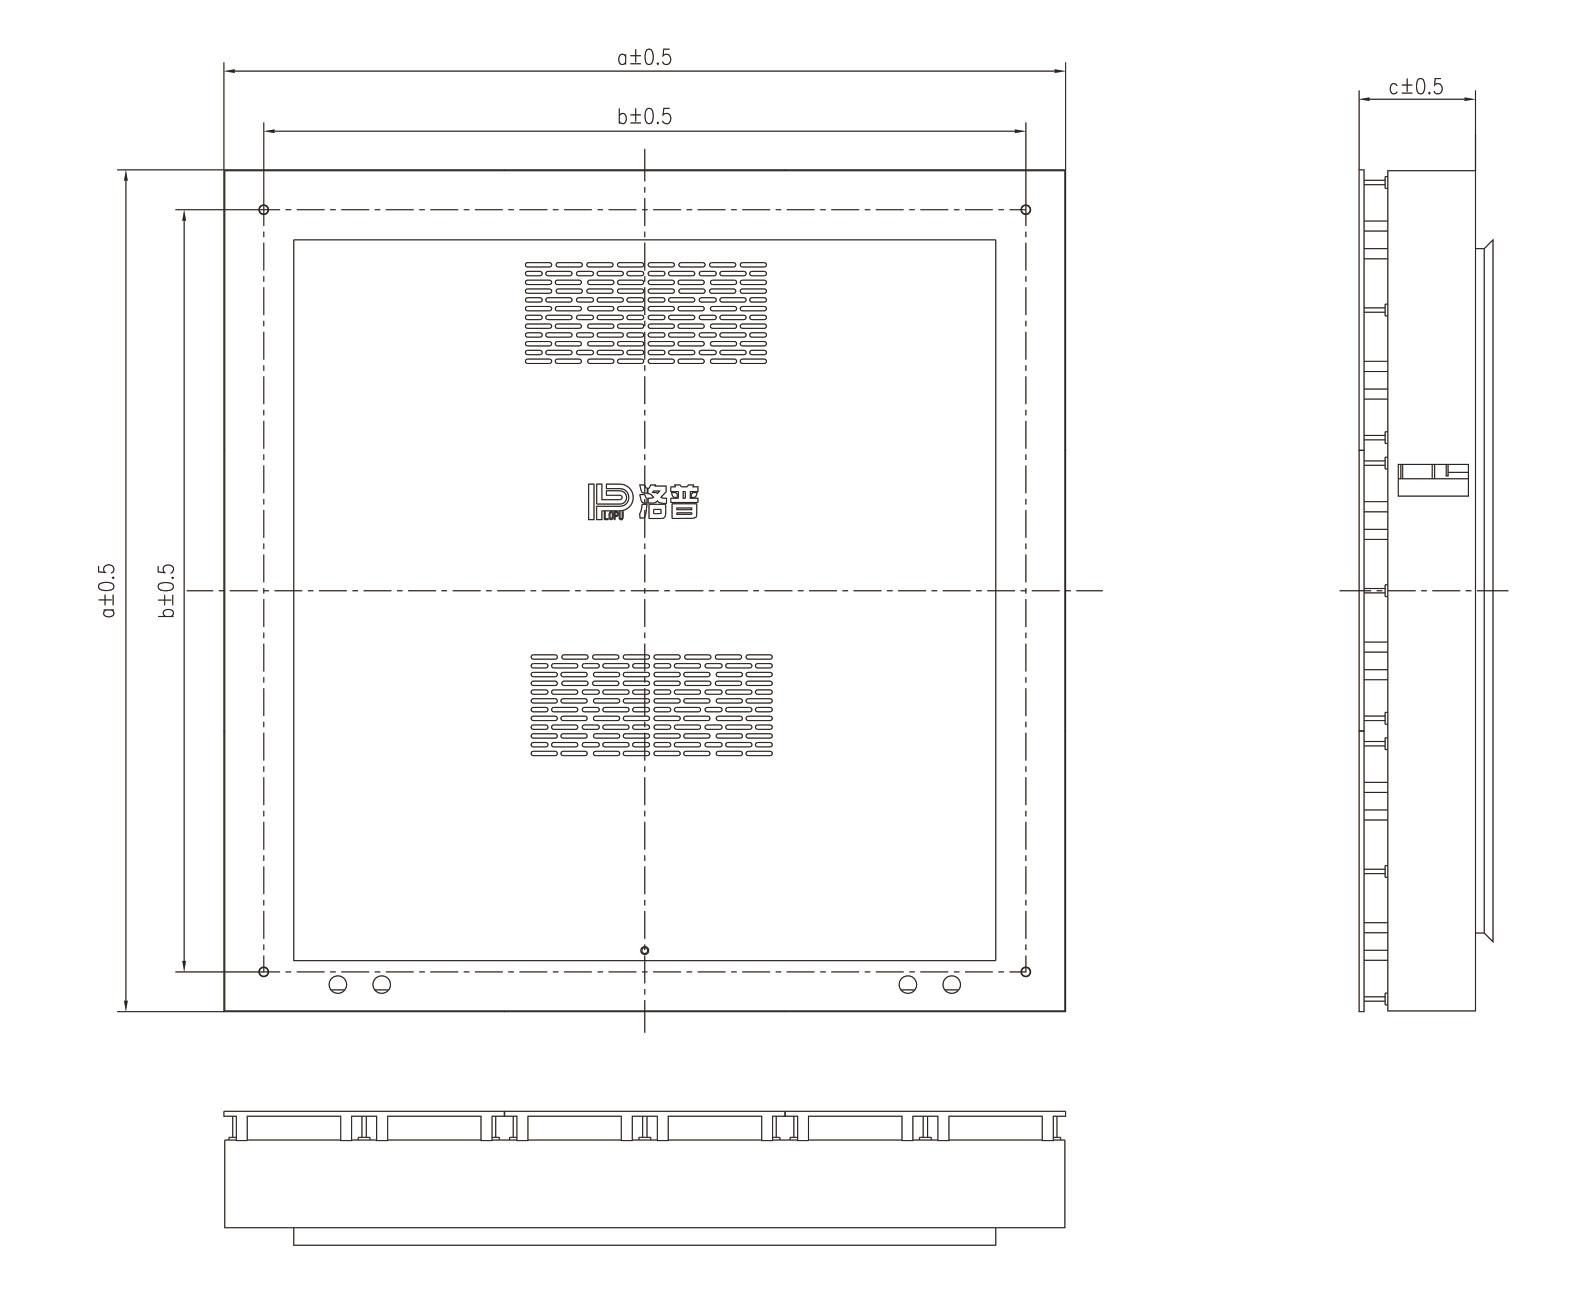 Indoor SMD dimension